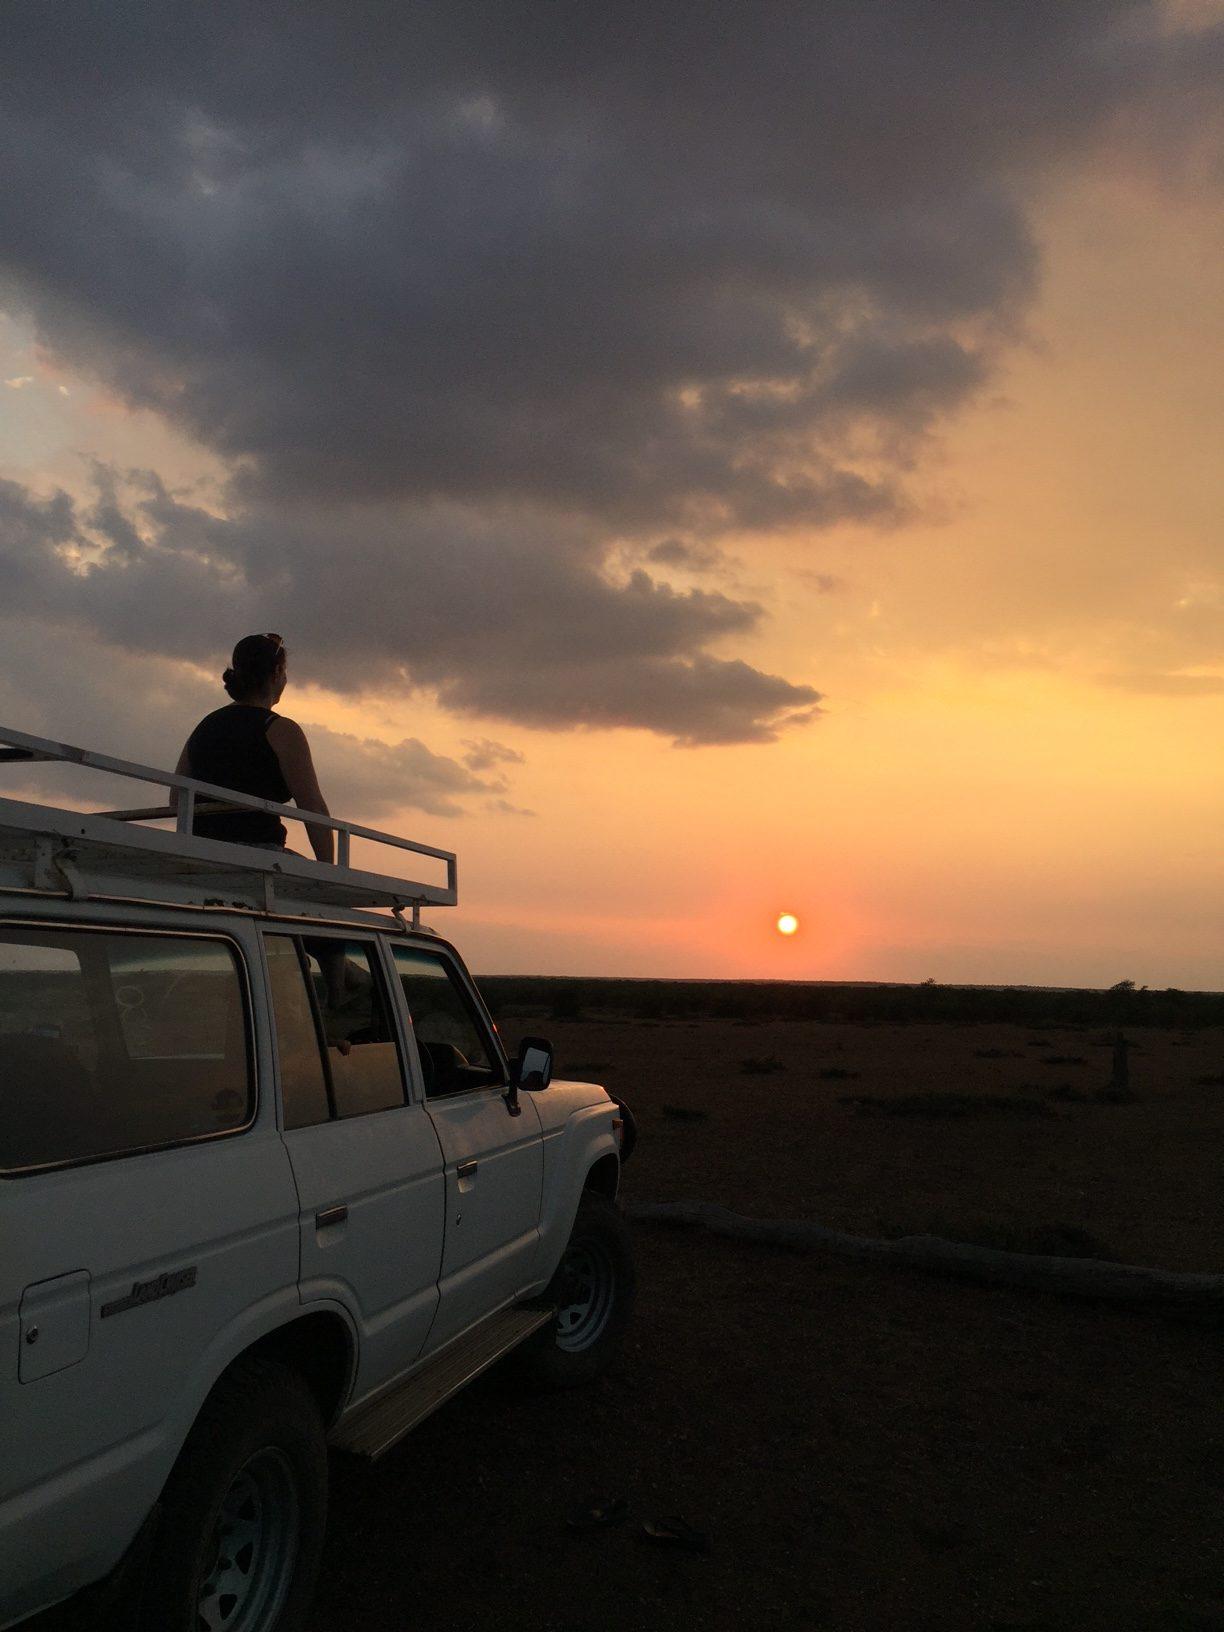 Admiring the sunset over Kruger